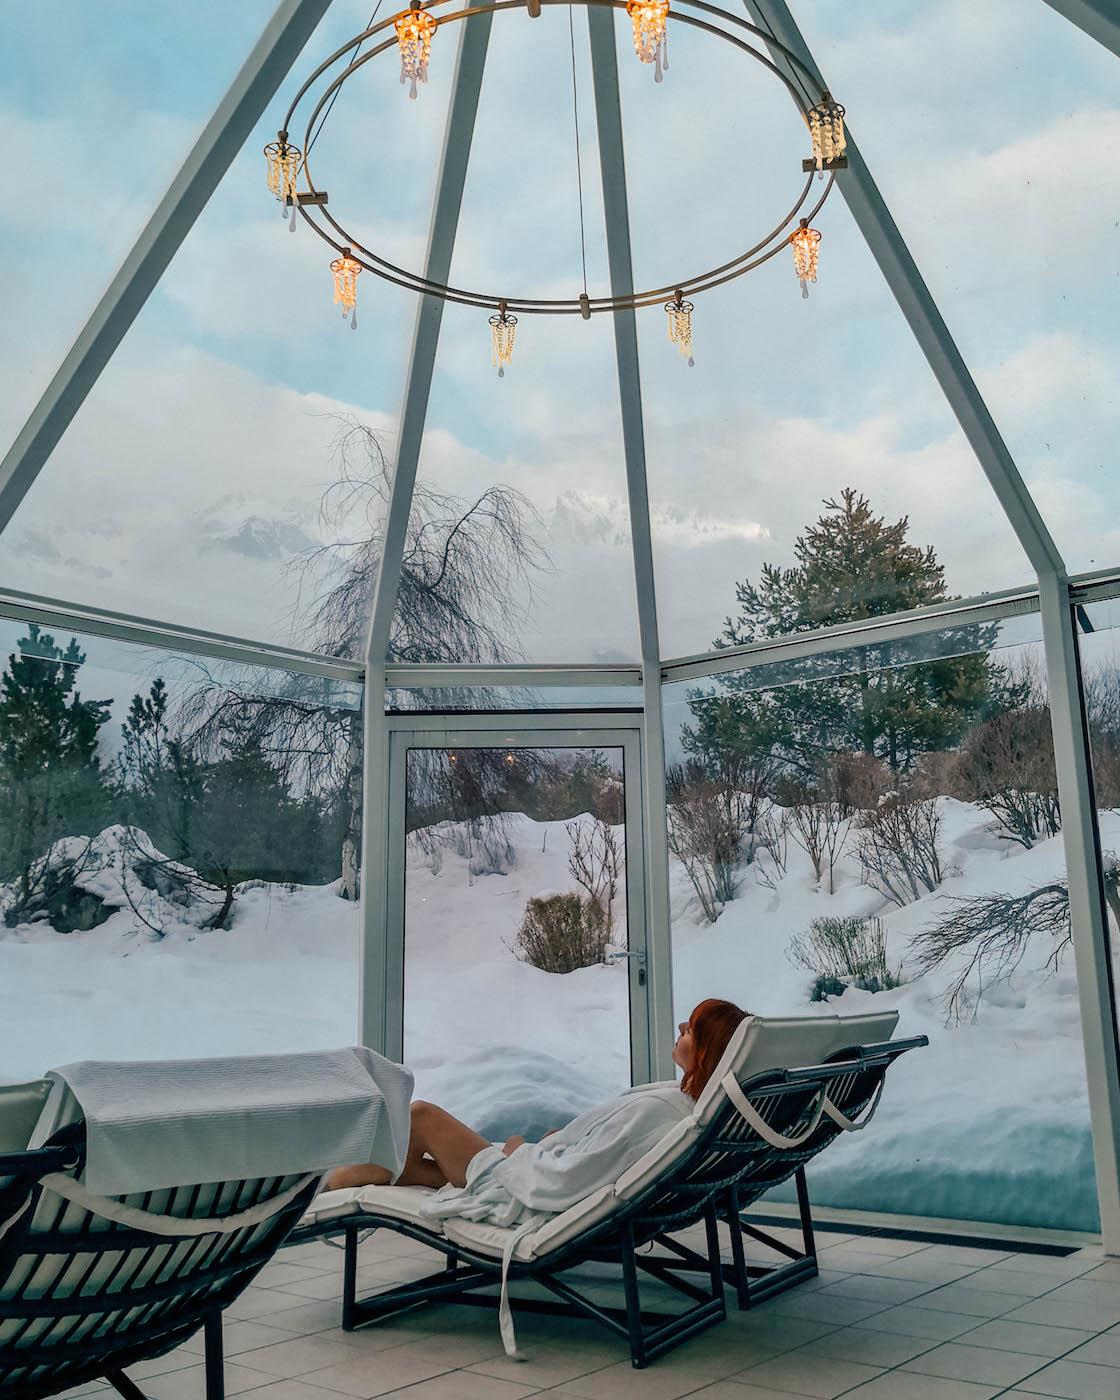 Mieminger Plateau Hotel Kaysers Tirolresort